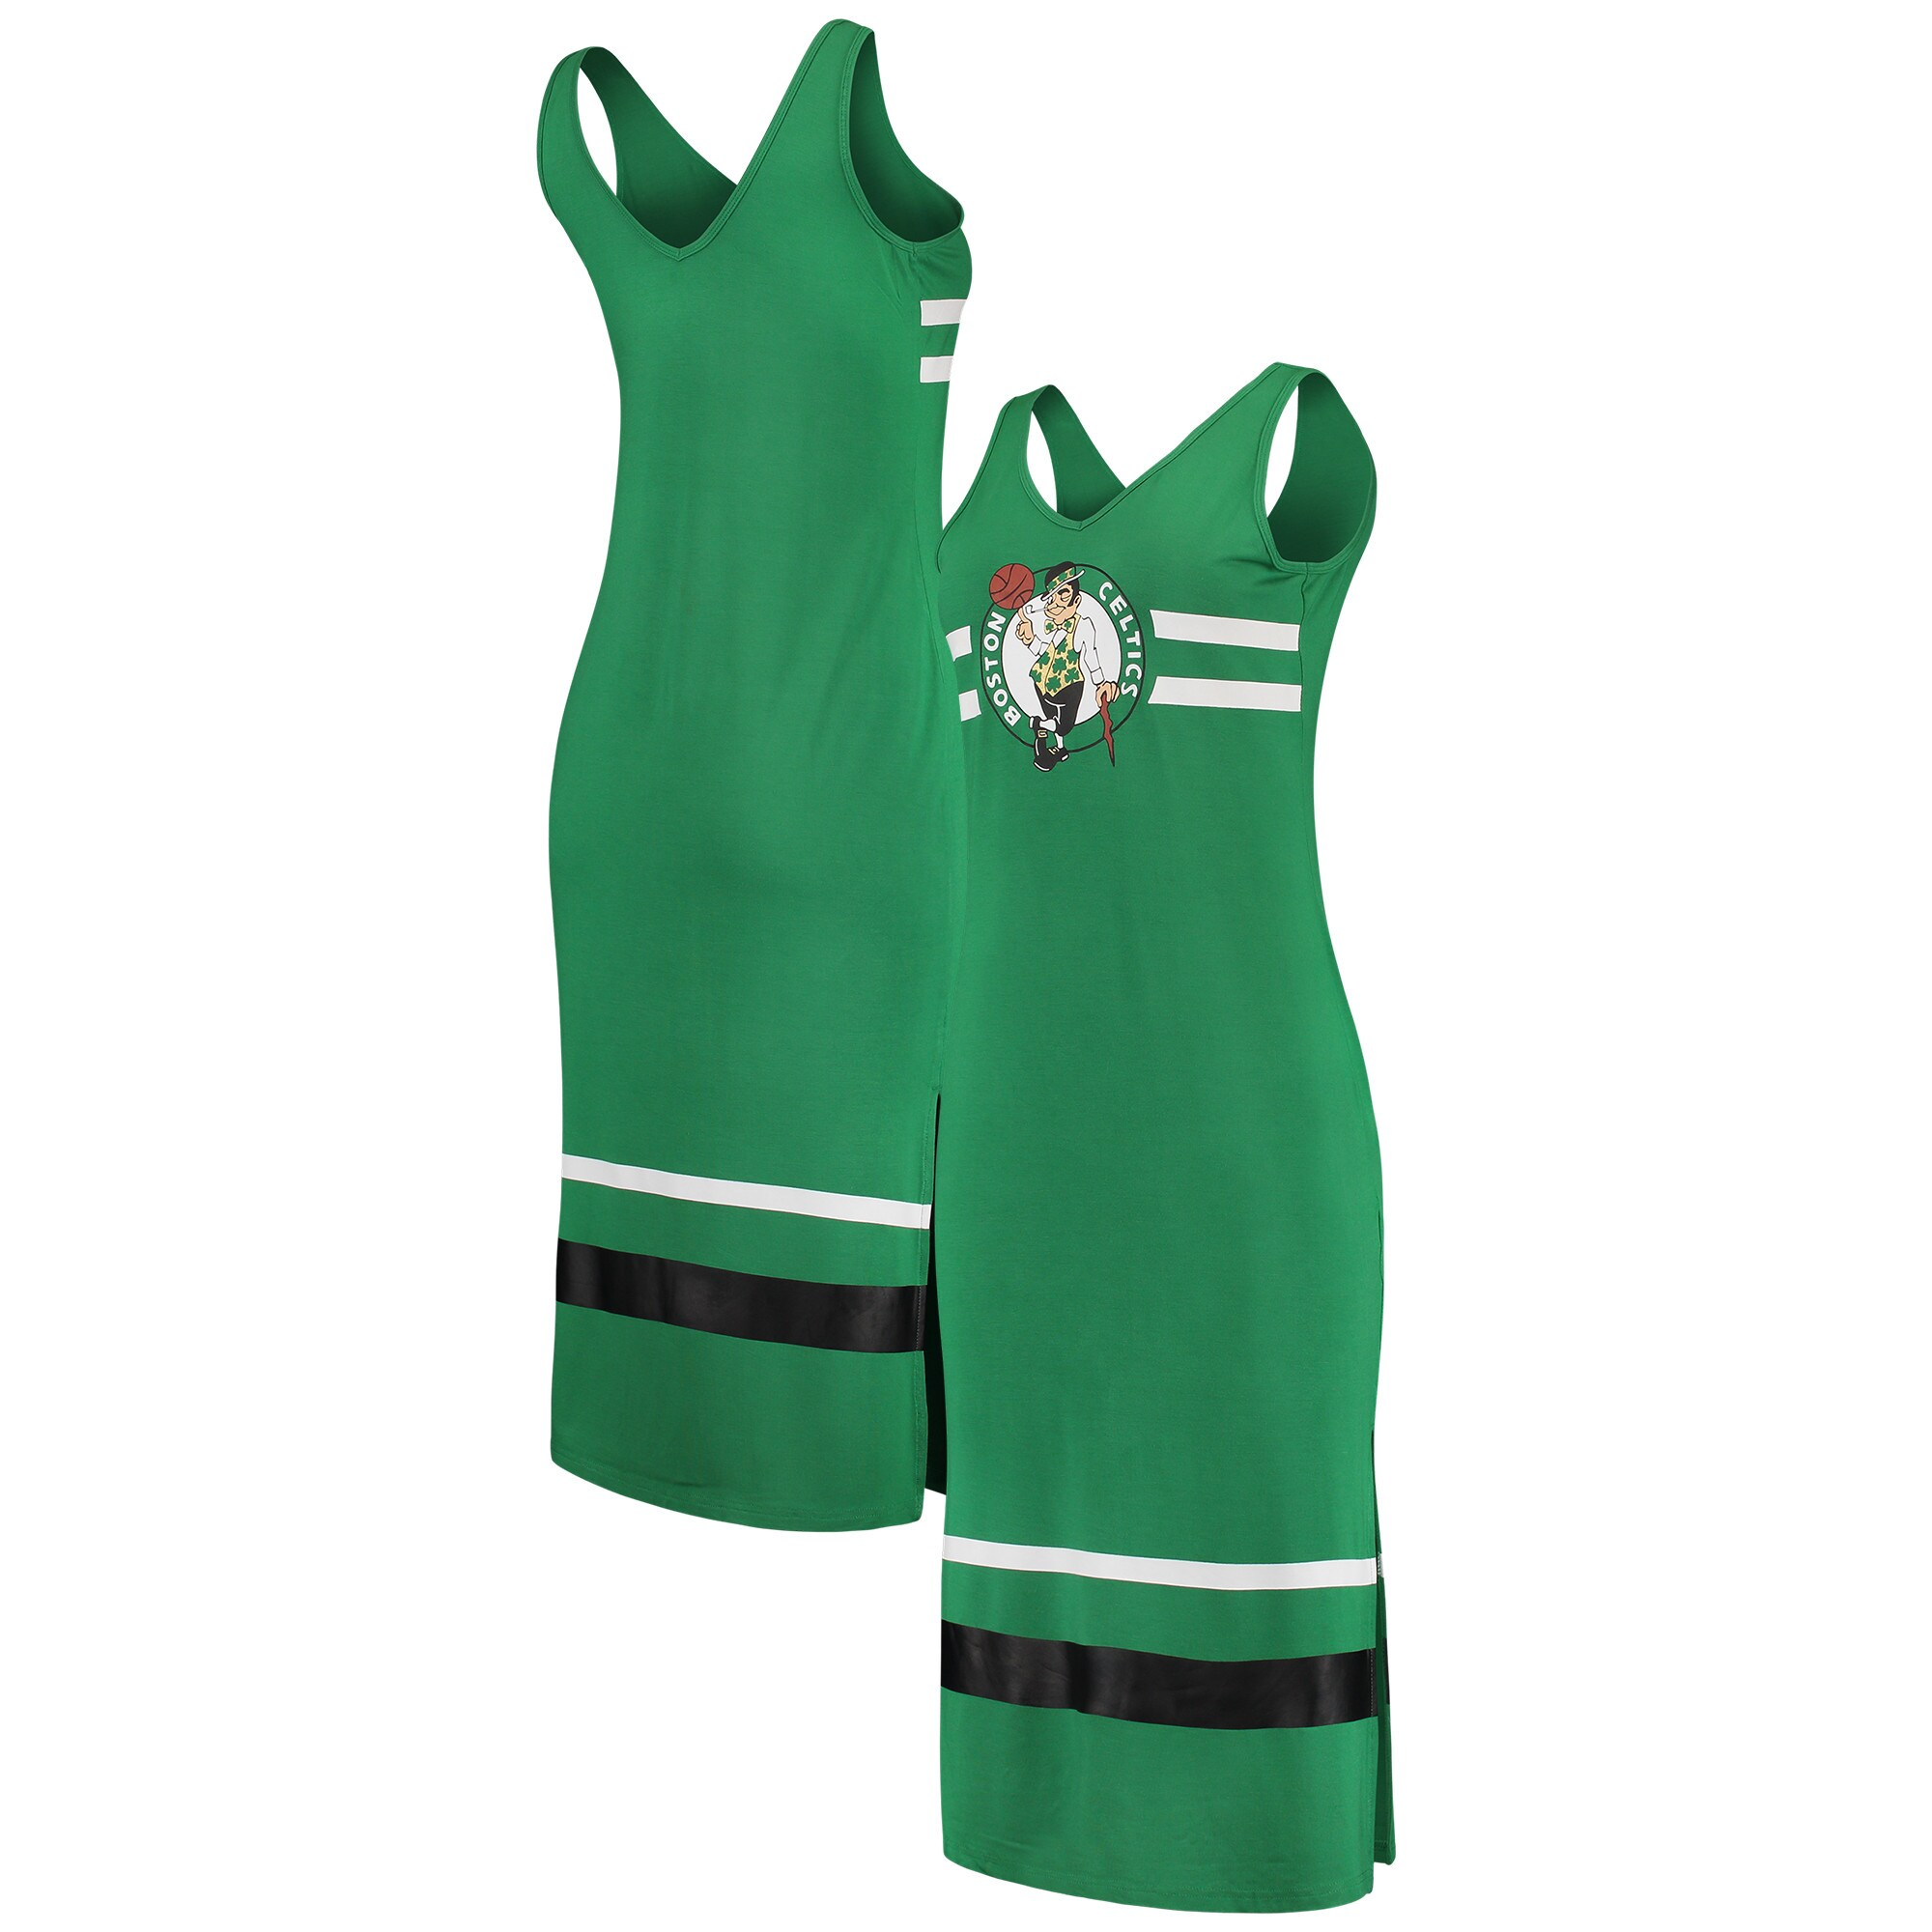 Boston Celtics G-III 4Her by Carl Banks Women's Maxi Dress - Kelly Green/Black